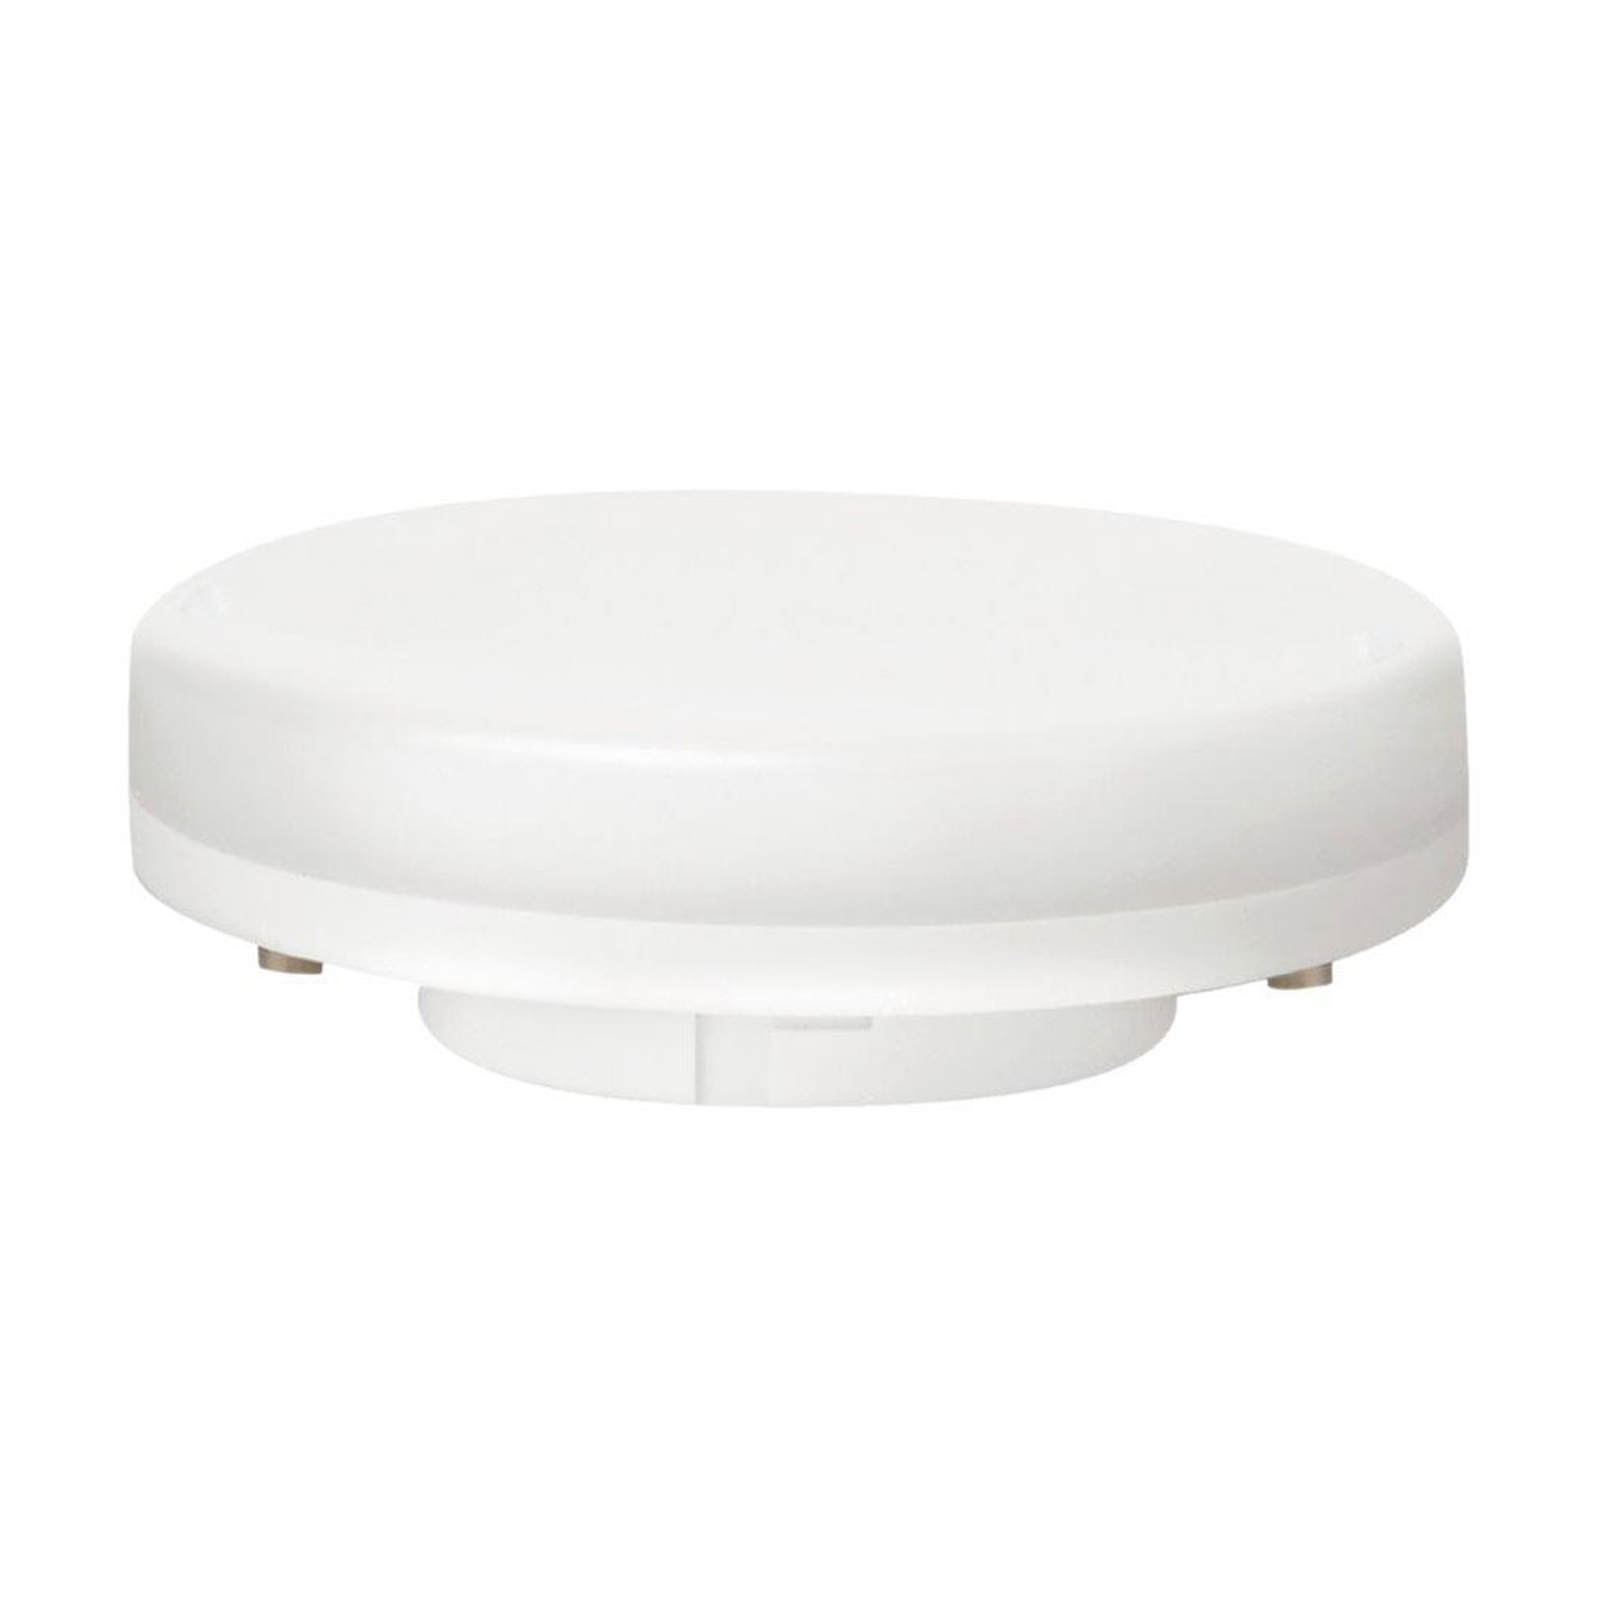 GX53 LED-lampe, 6,5 W, 650 lm, 3.000 K, matteret